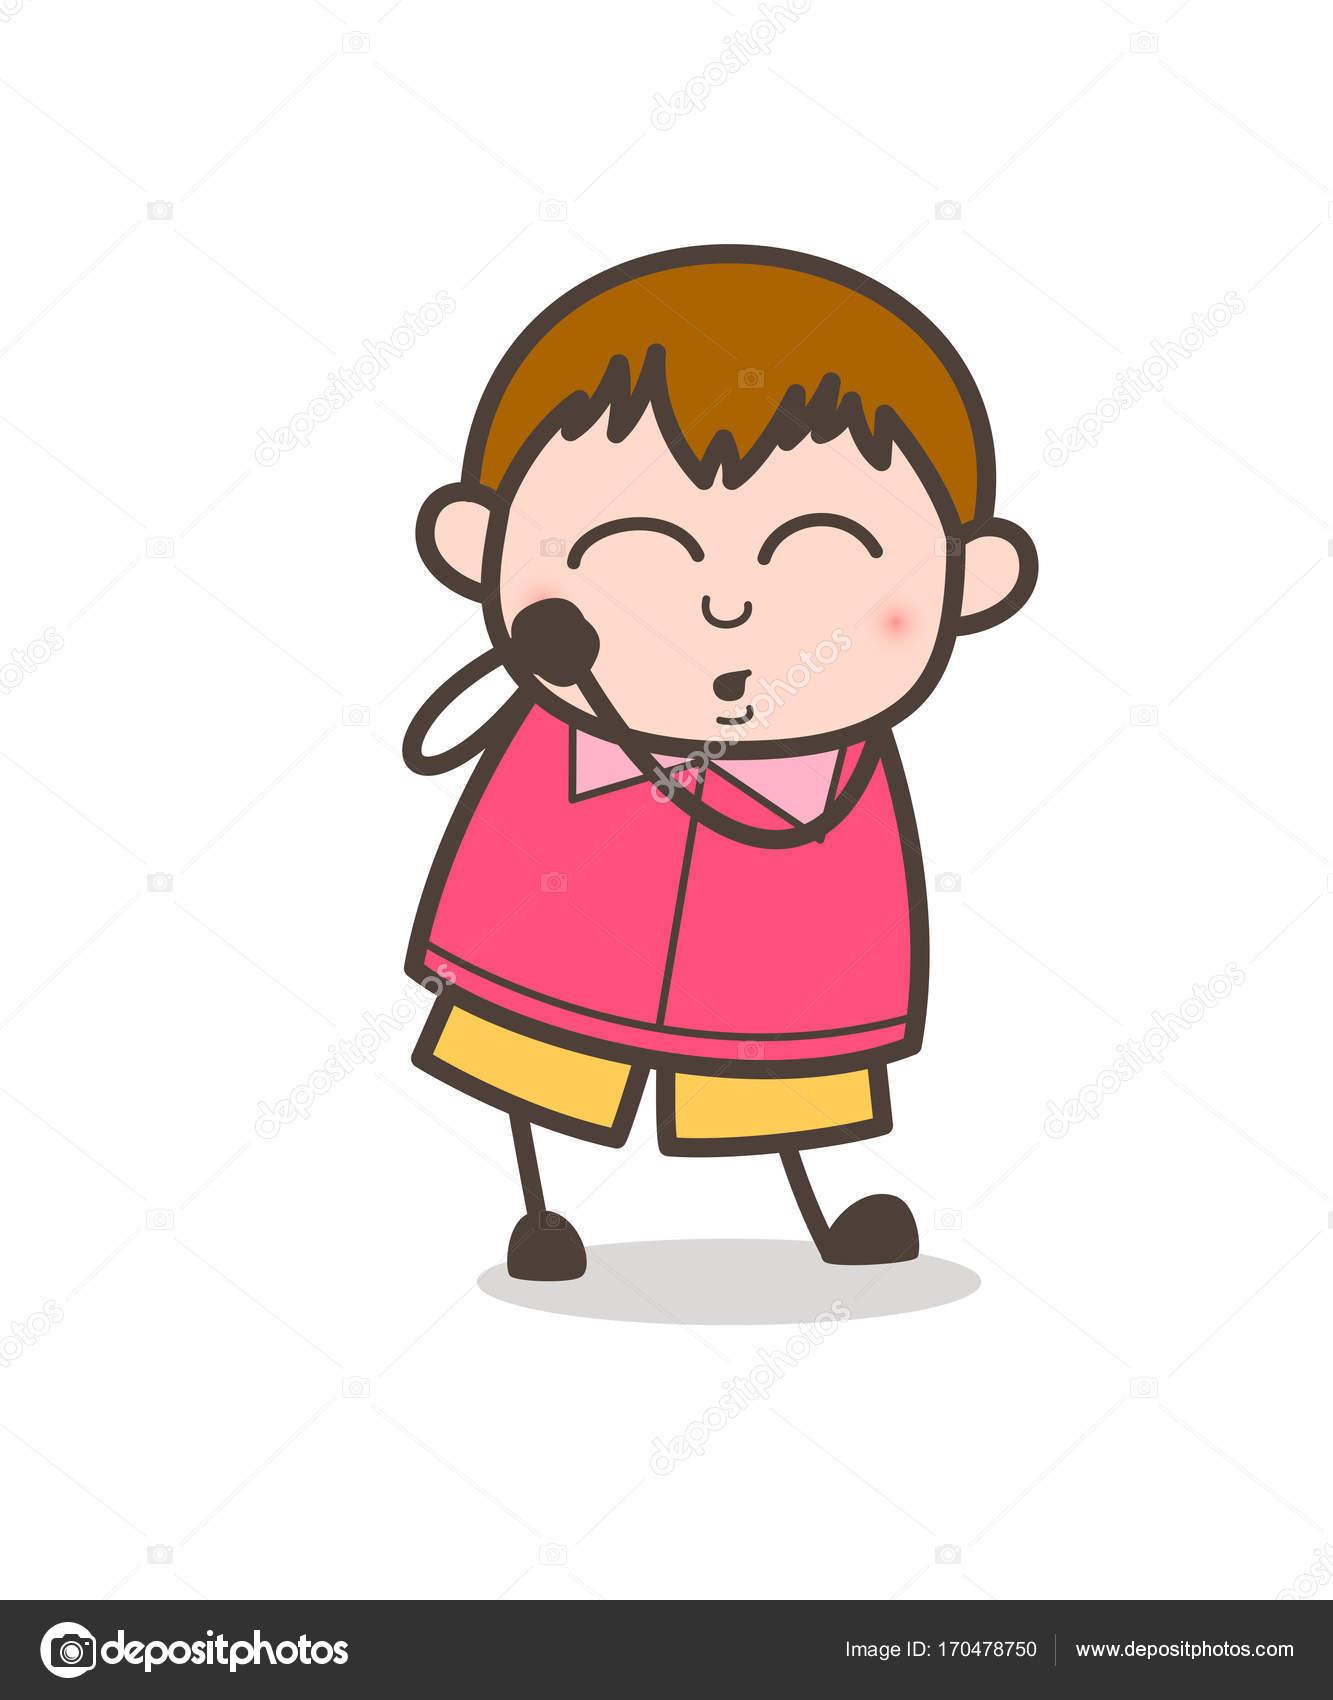 Feeling Lovely Expression - Cute Cartoon Fat Kid